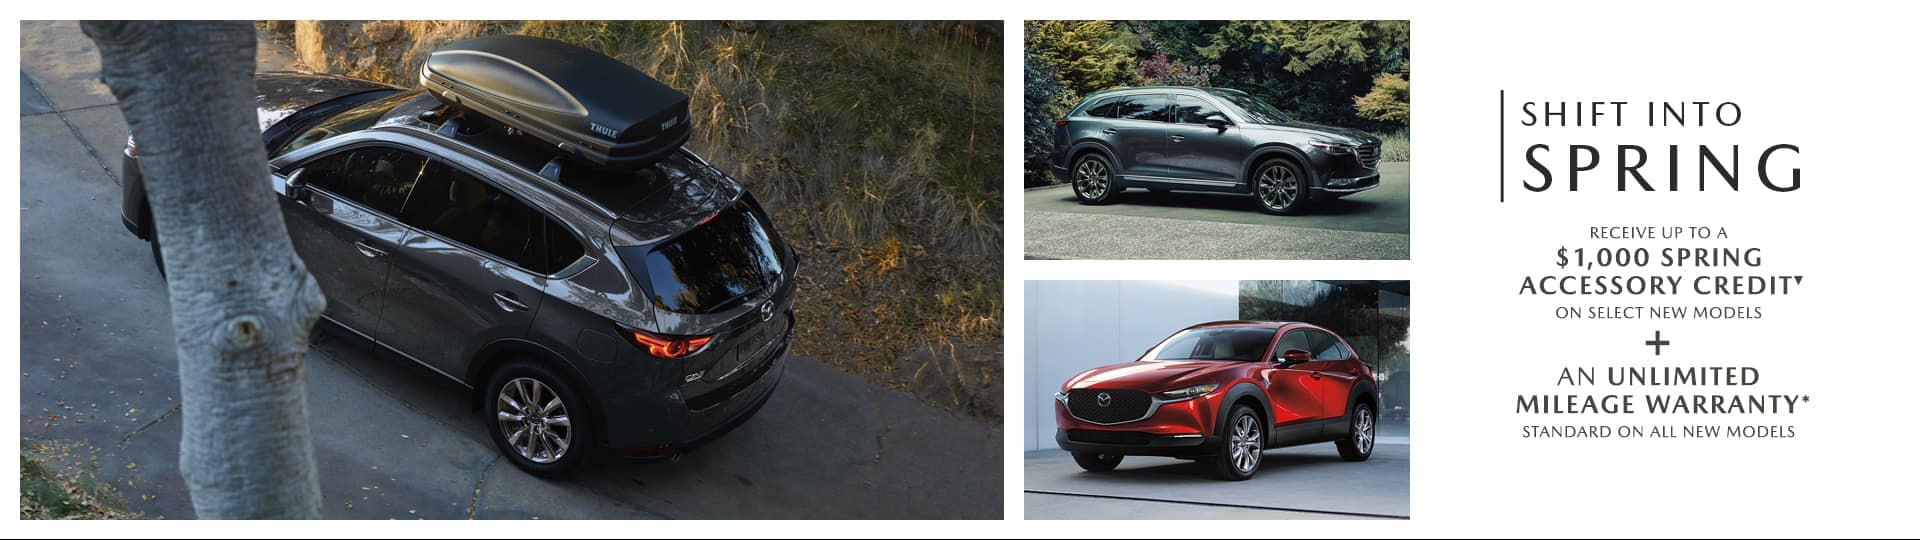 Shift Into Spring @ Palladino Mazda